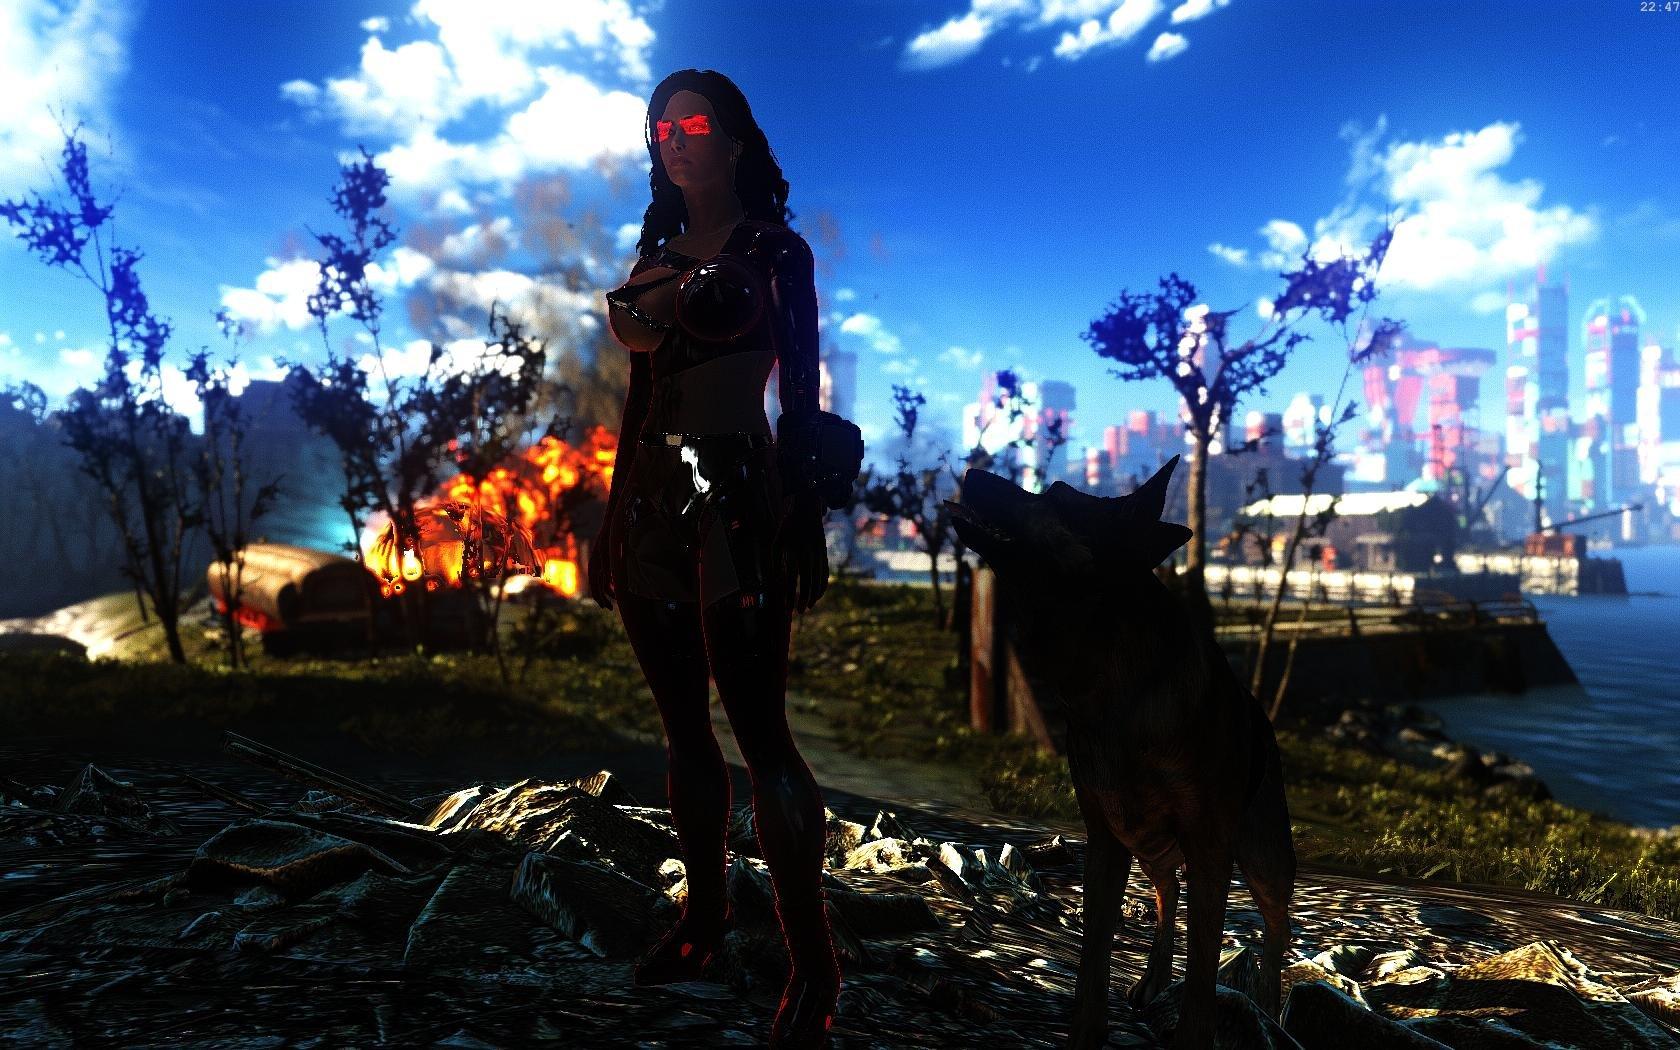 Fallout4 2019-02-04 22-47-13-96